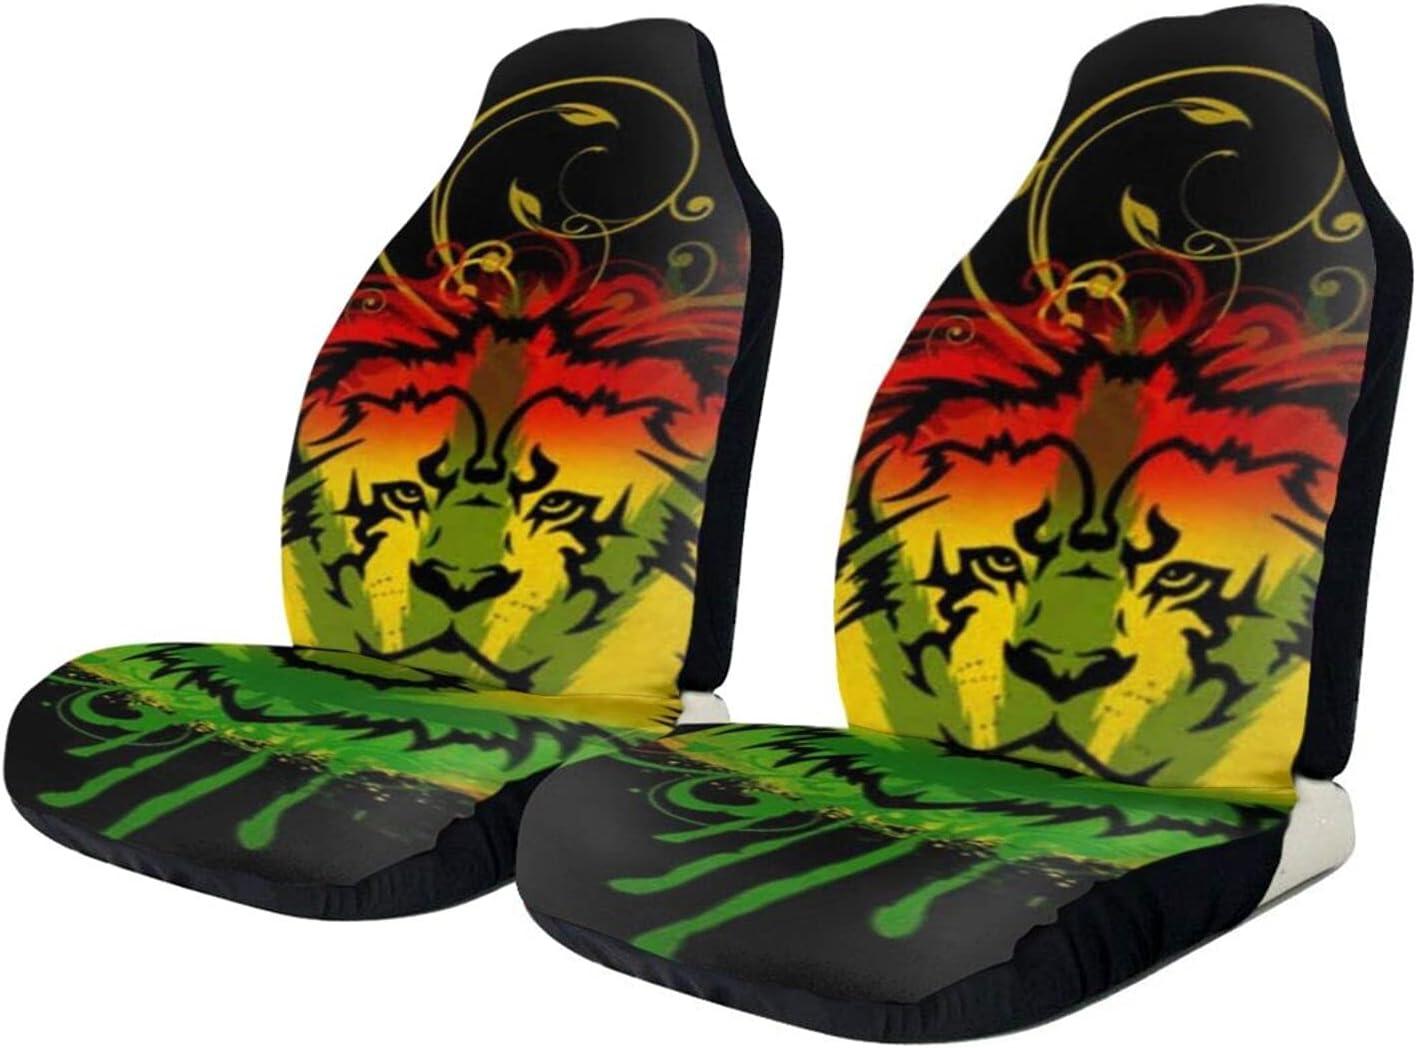 BCVDGFKJ Marijuana Leaves Rasta Lion Cannabis se price PCS New product!! 2 Front car